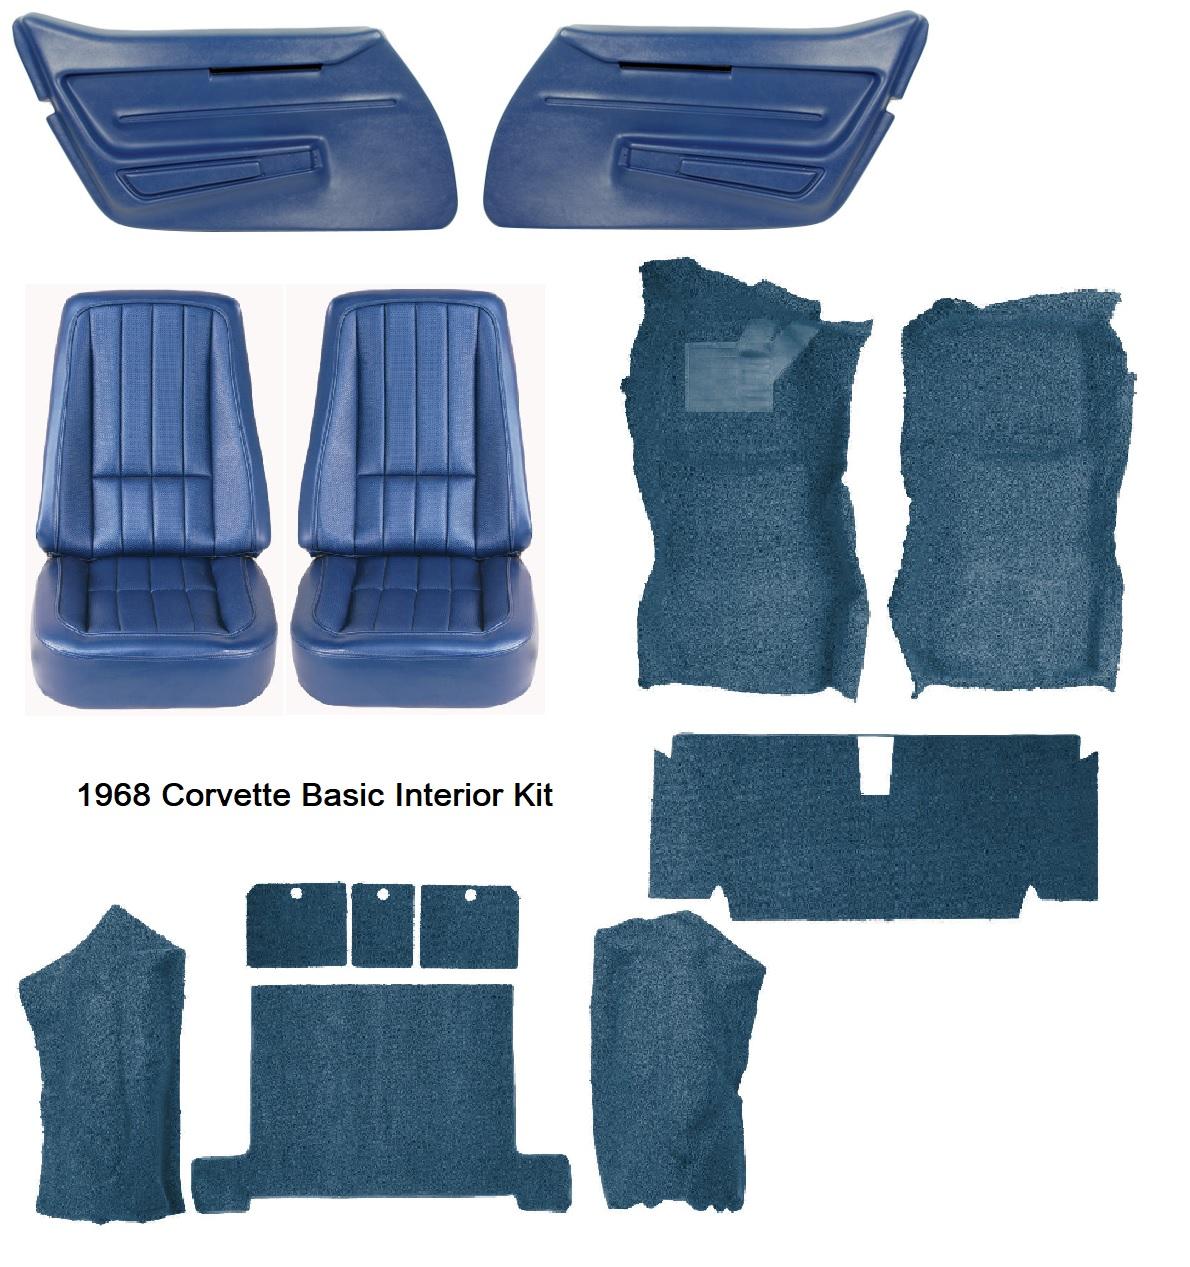 1968 Corvette Interior Package